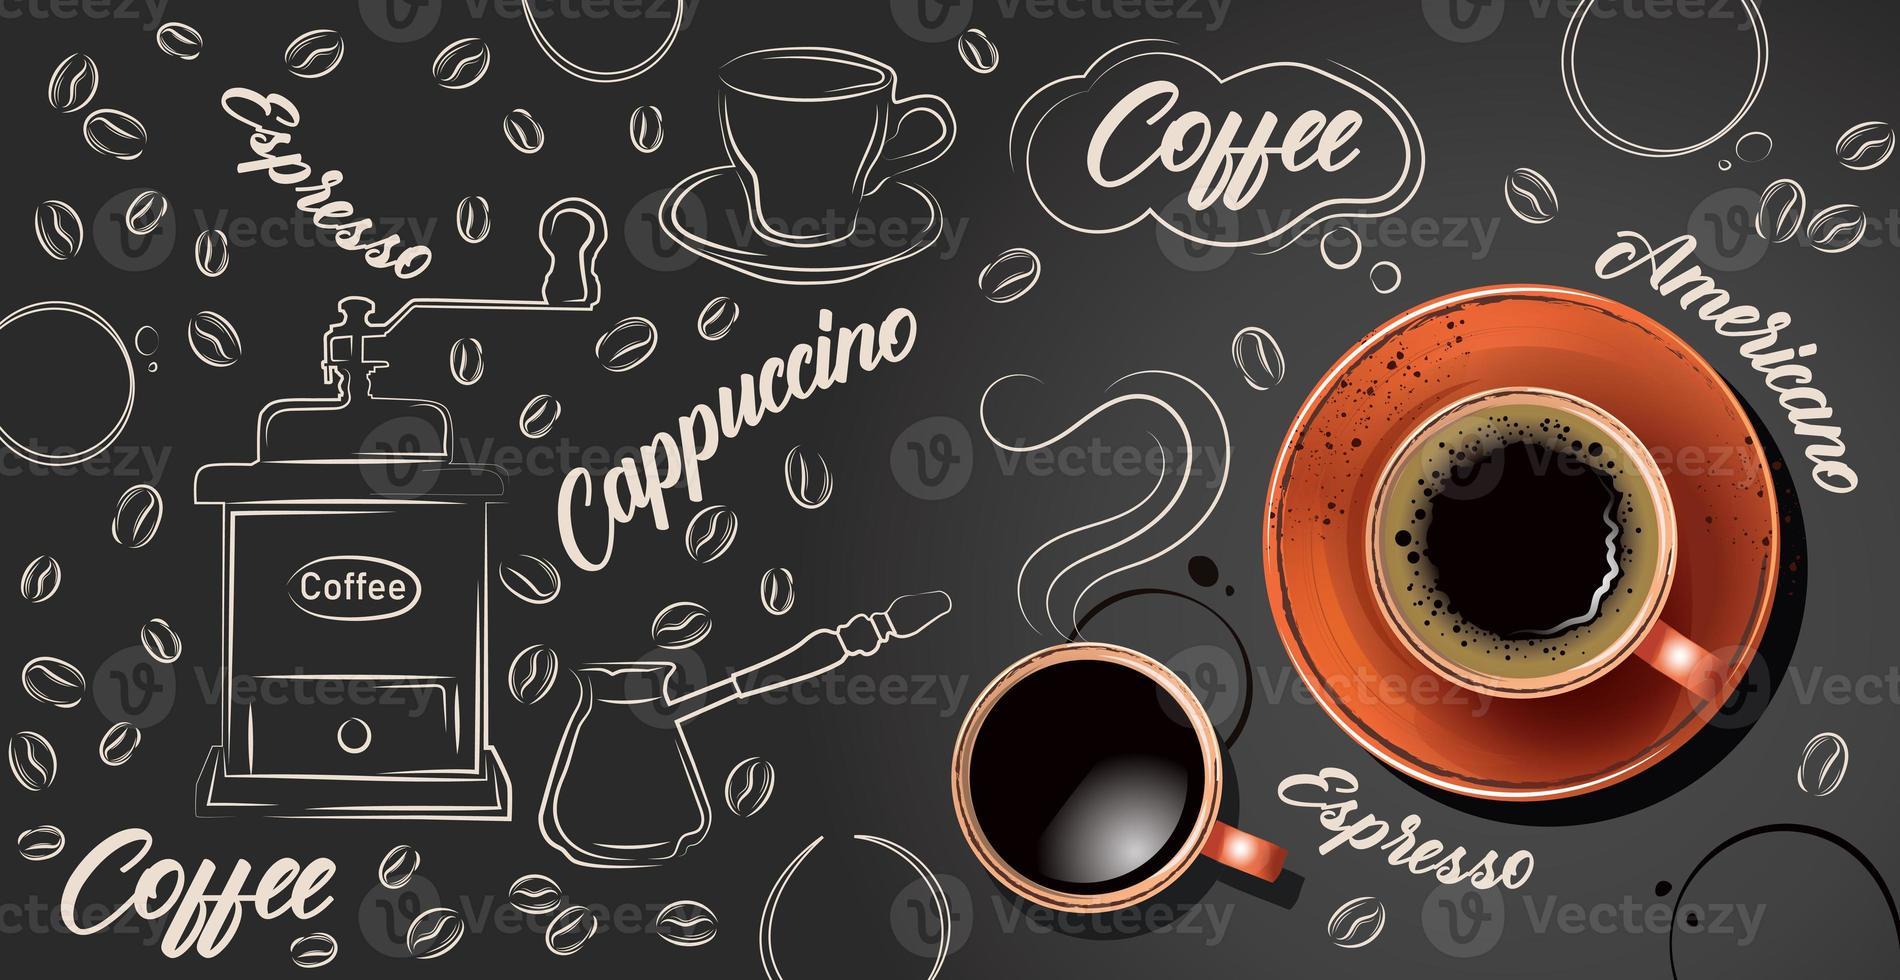 kaffe bakgrund med realistisk kopp kaffe - vektor foto